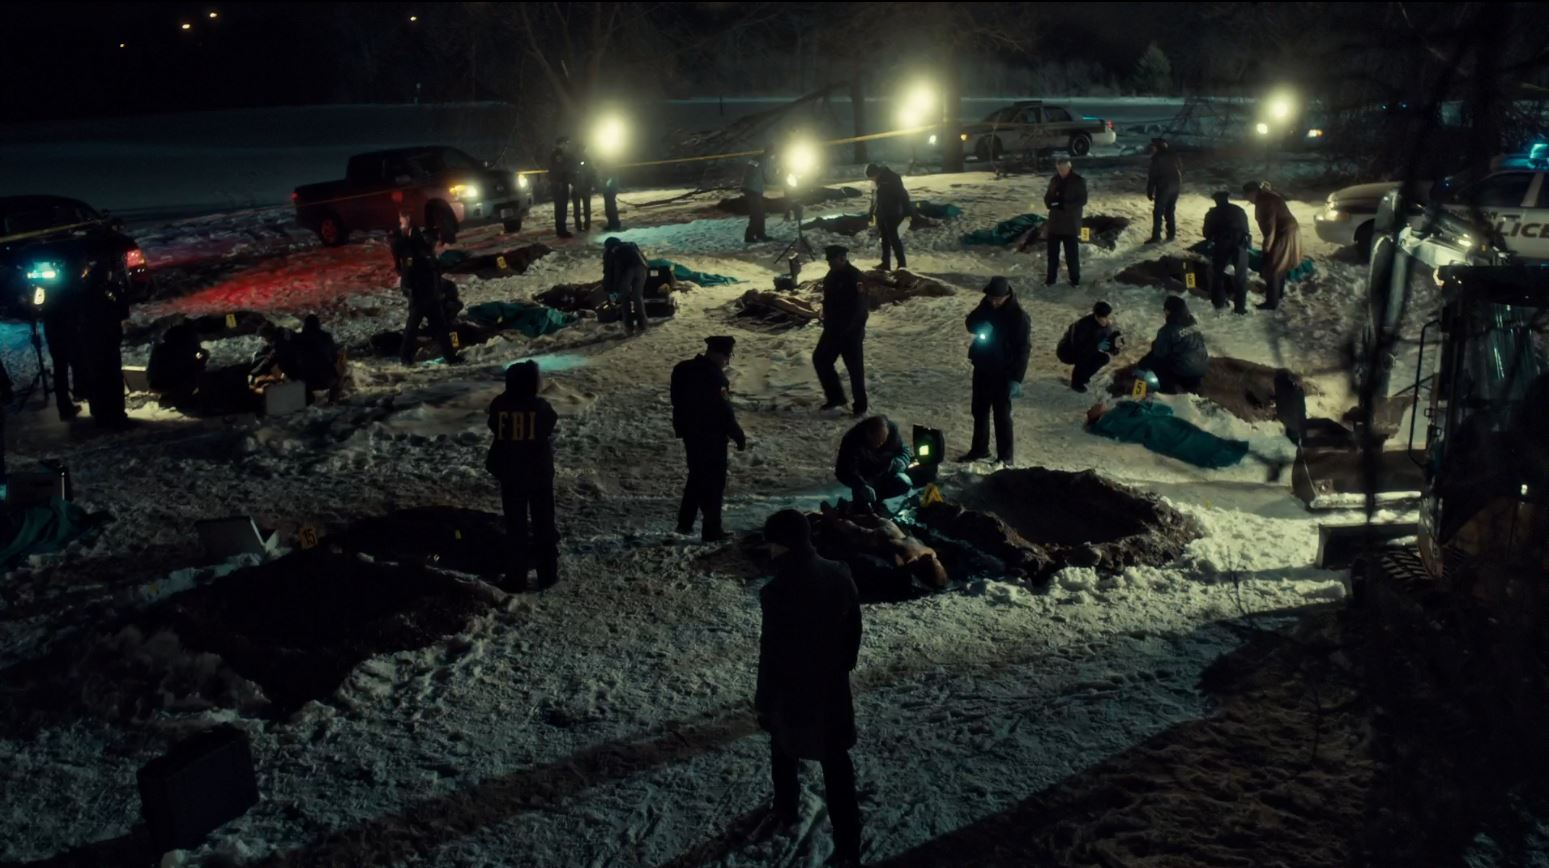 Hannibal Season 2 Episode 8 Su-zakana - The FBI finds more bodies